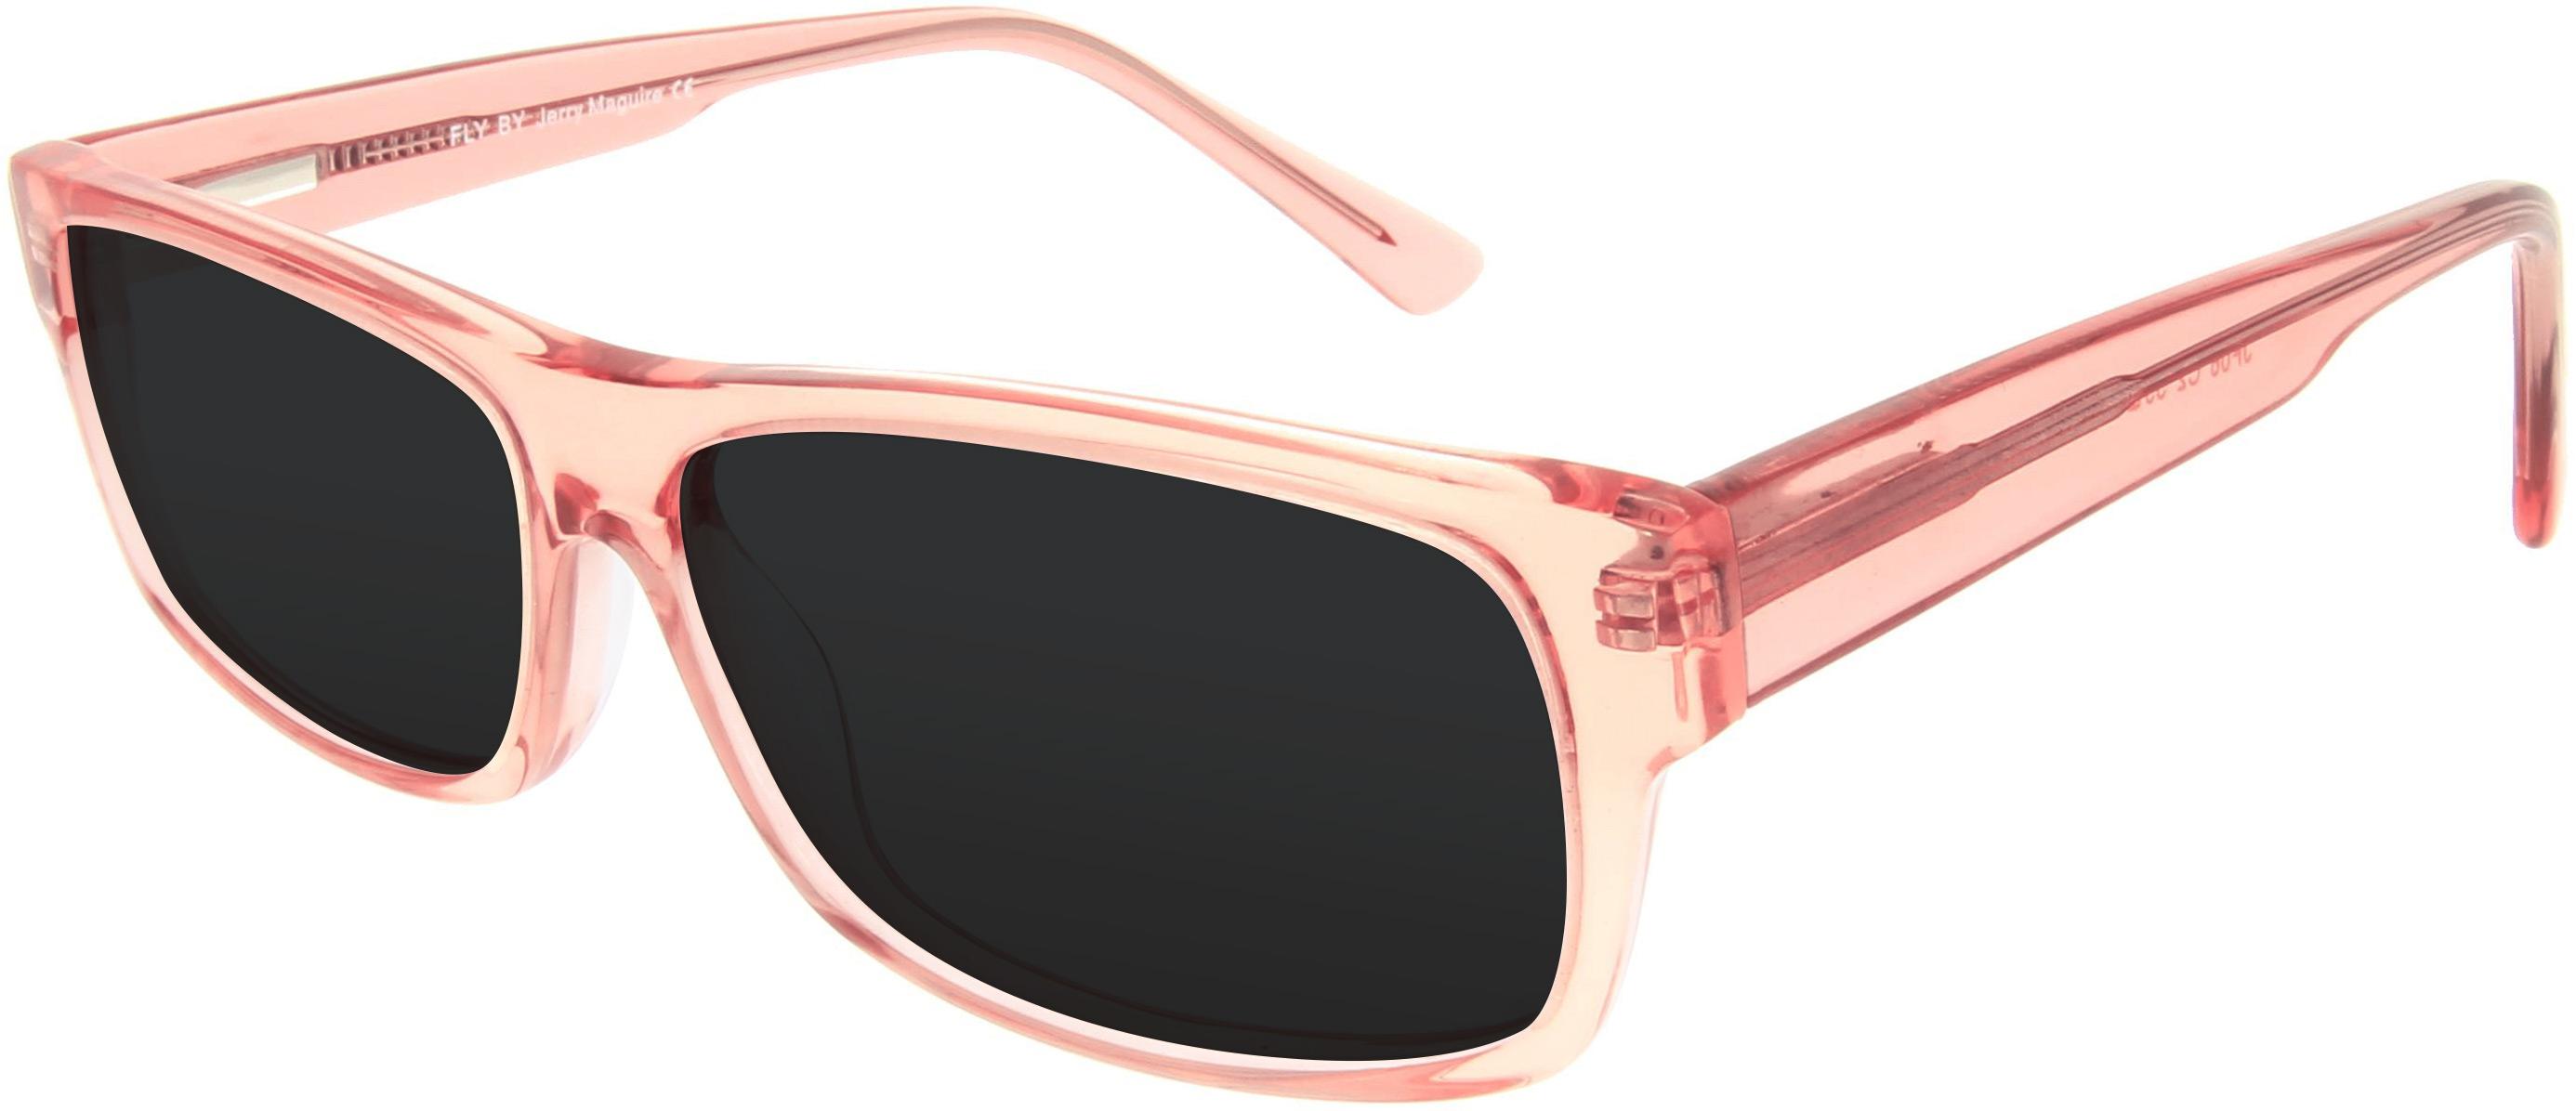 Sonnenbrille in hellem Lachs-Rosa